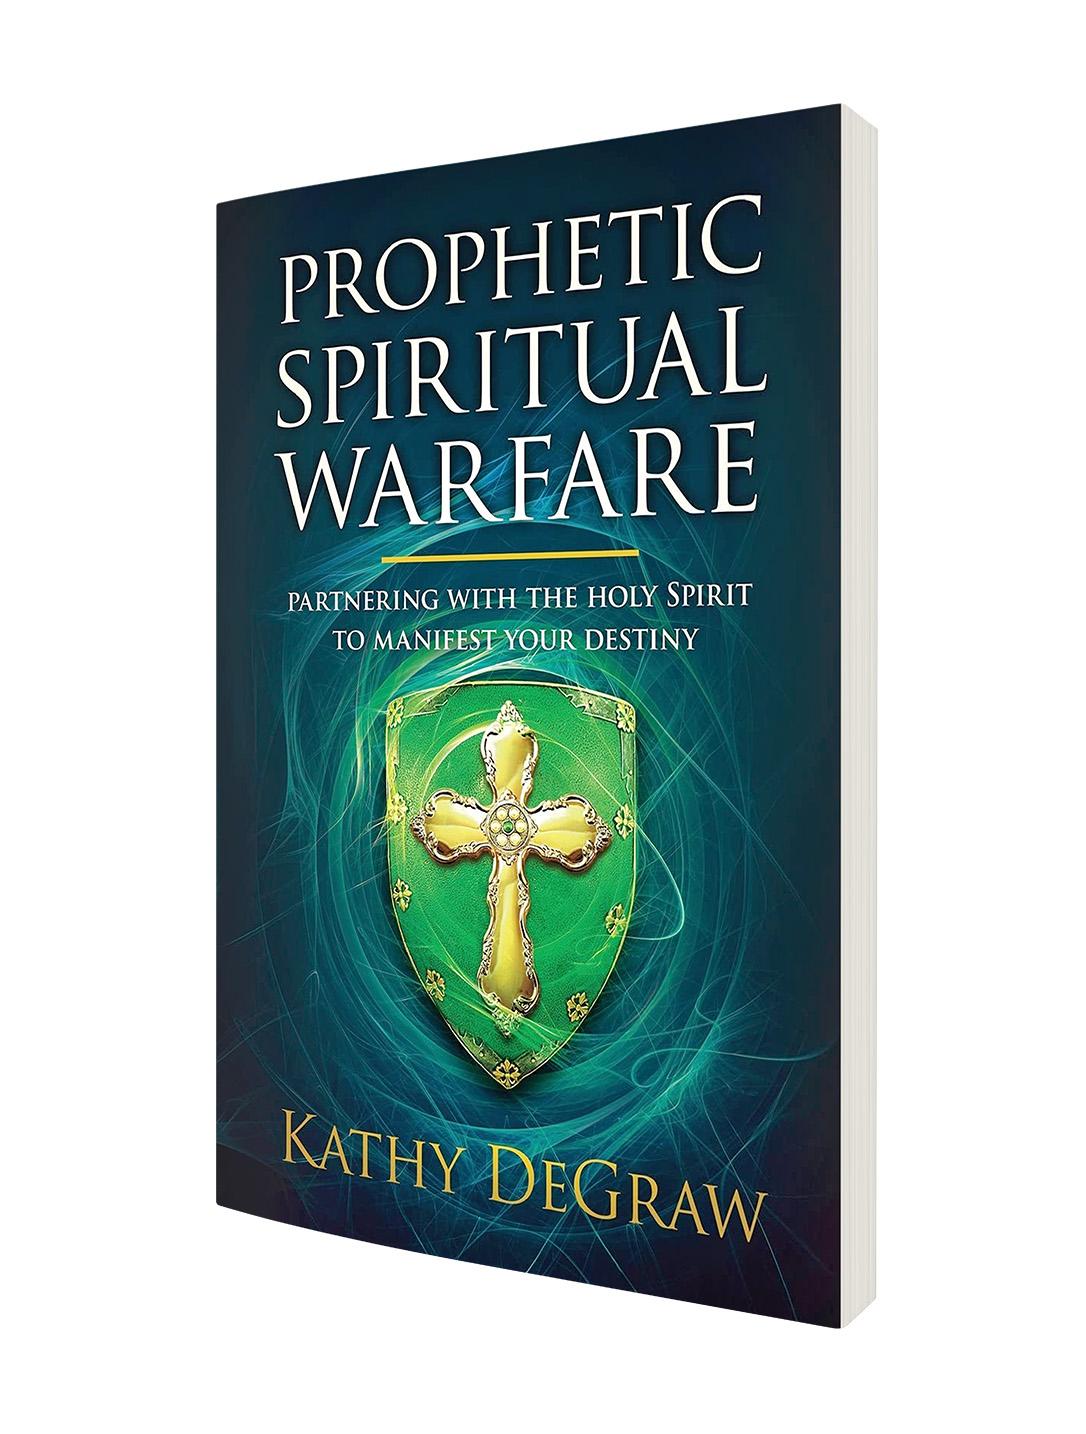 Prophetic Spiritual Warfare Book Offer